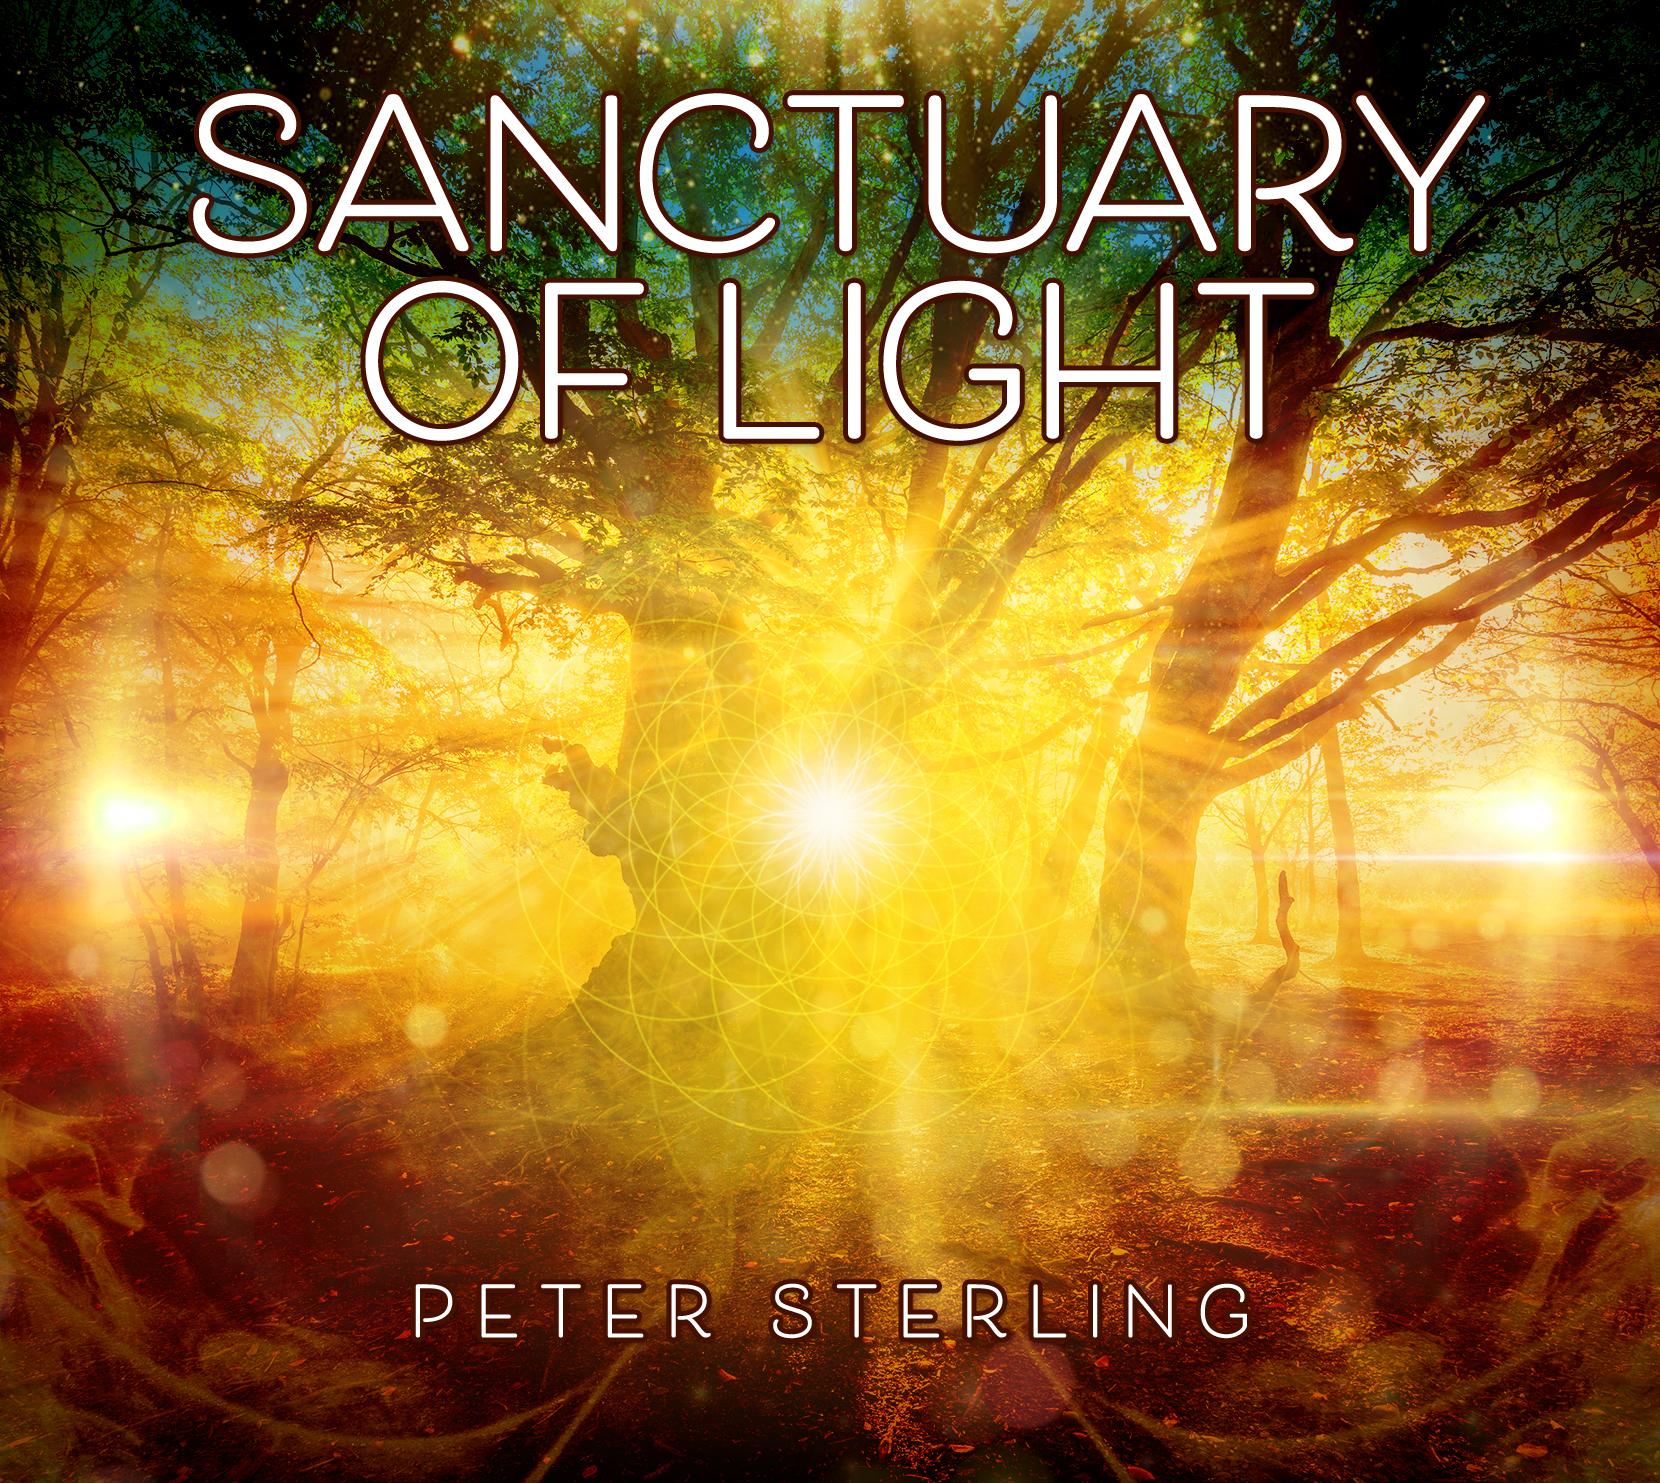 Peter Sterling - Sanctuary